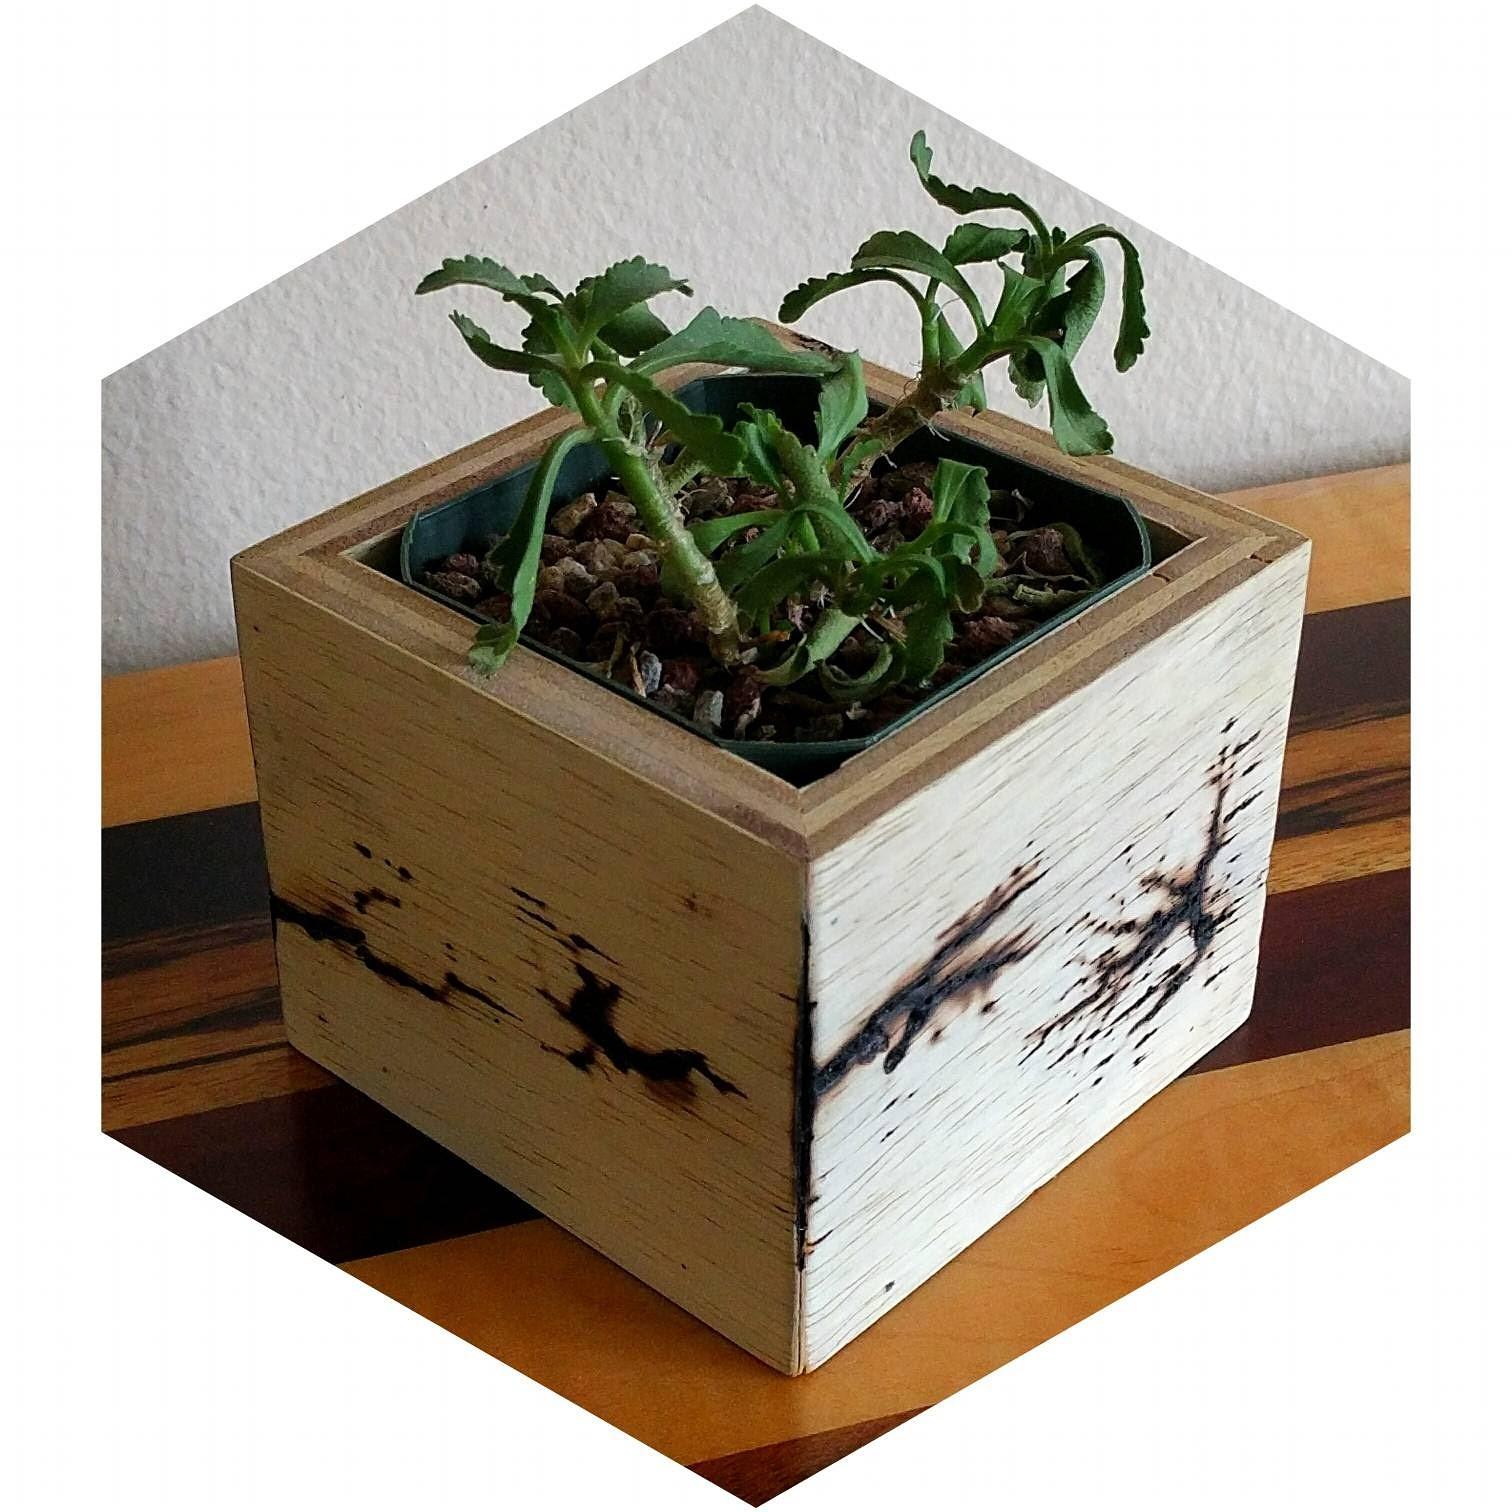 James Davis Designs succulent planter box with lichtenberg fractals aka electrical erosion